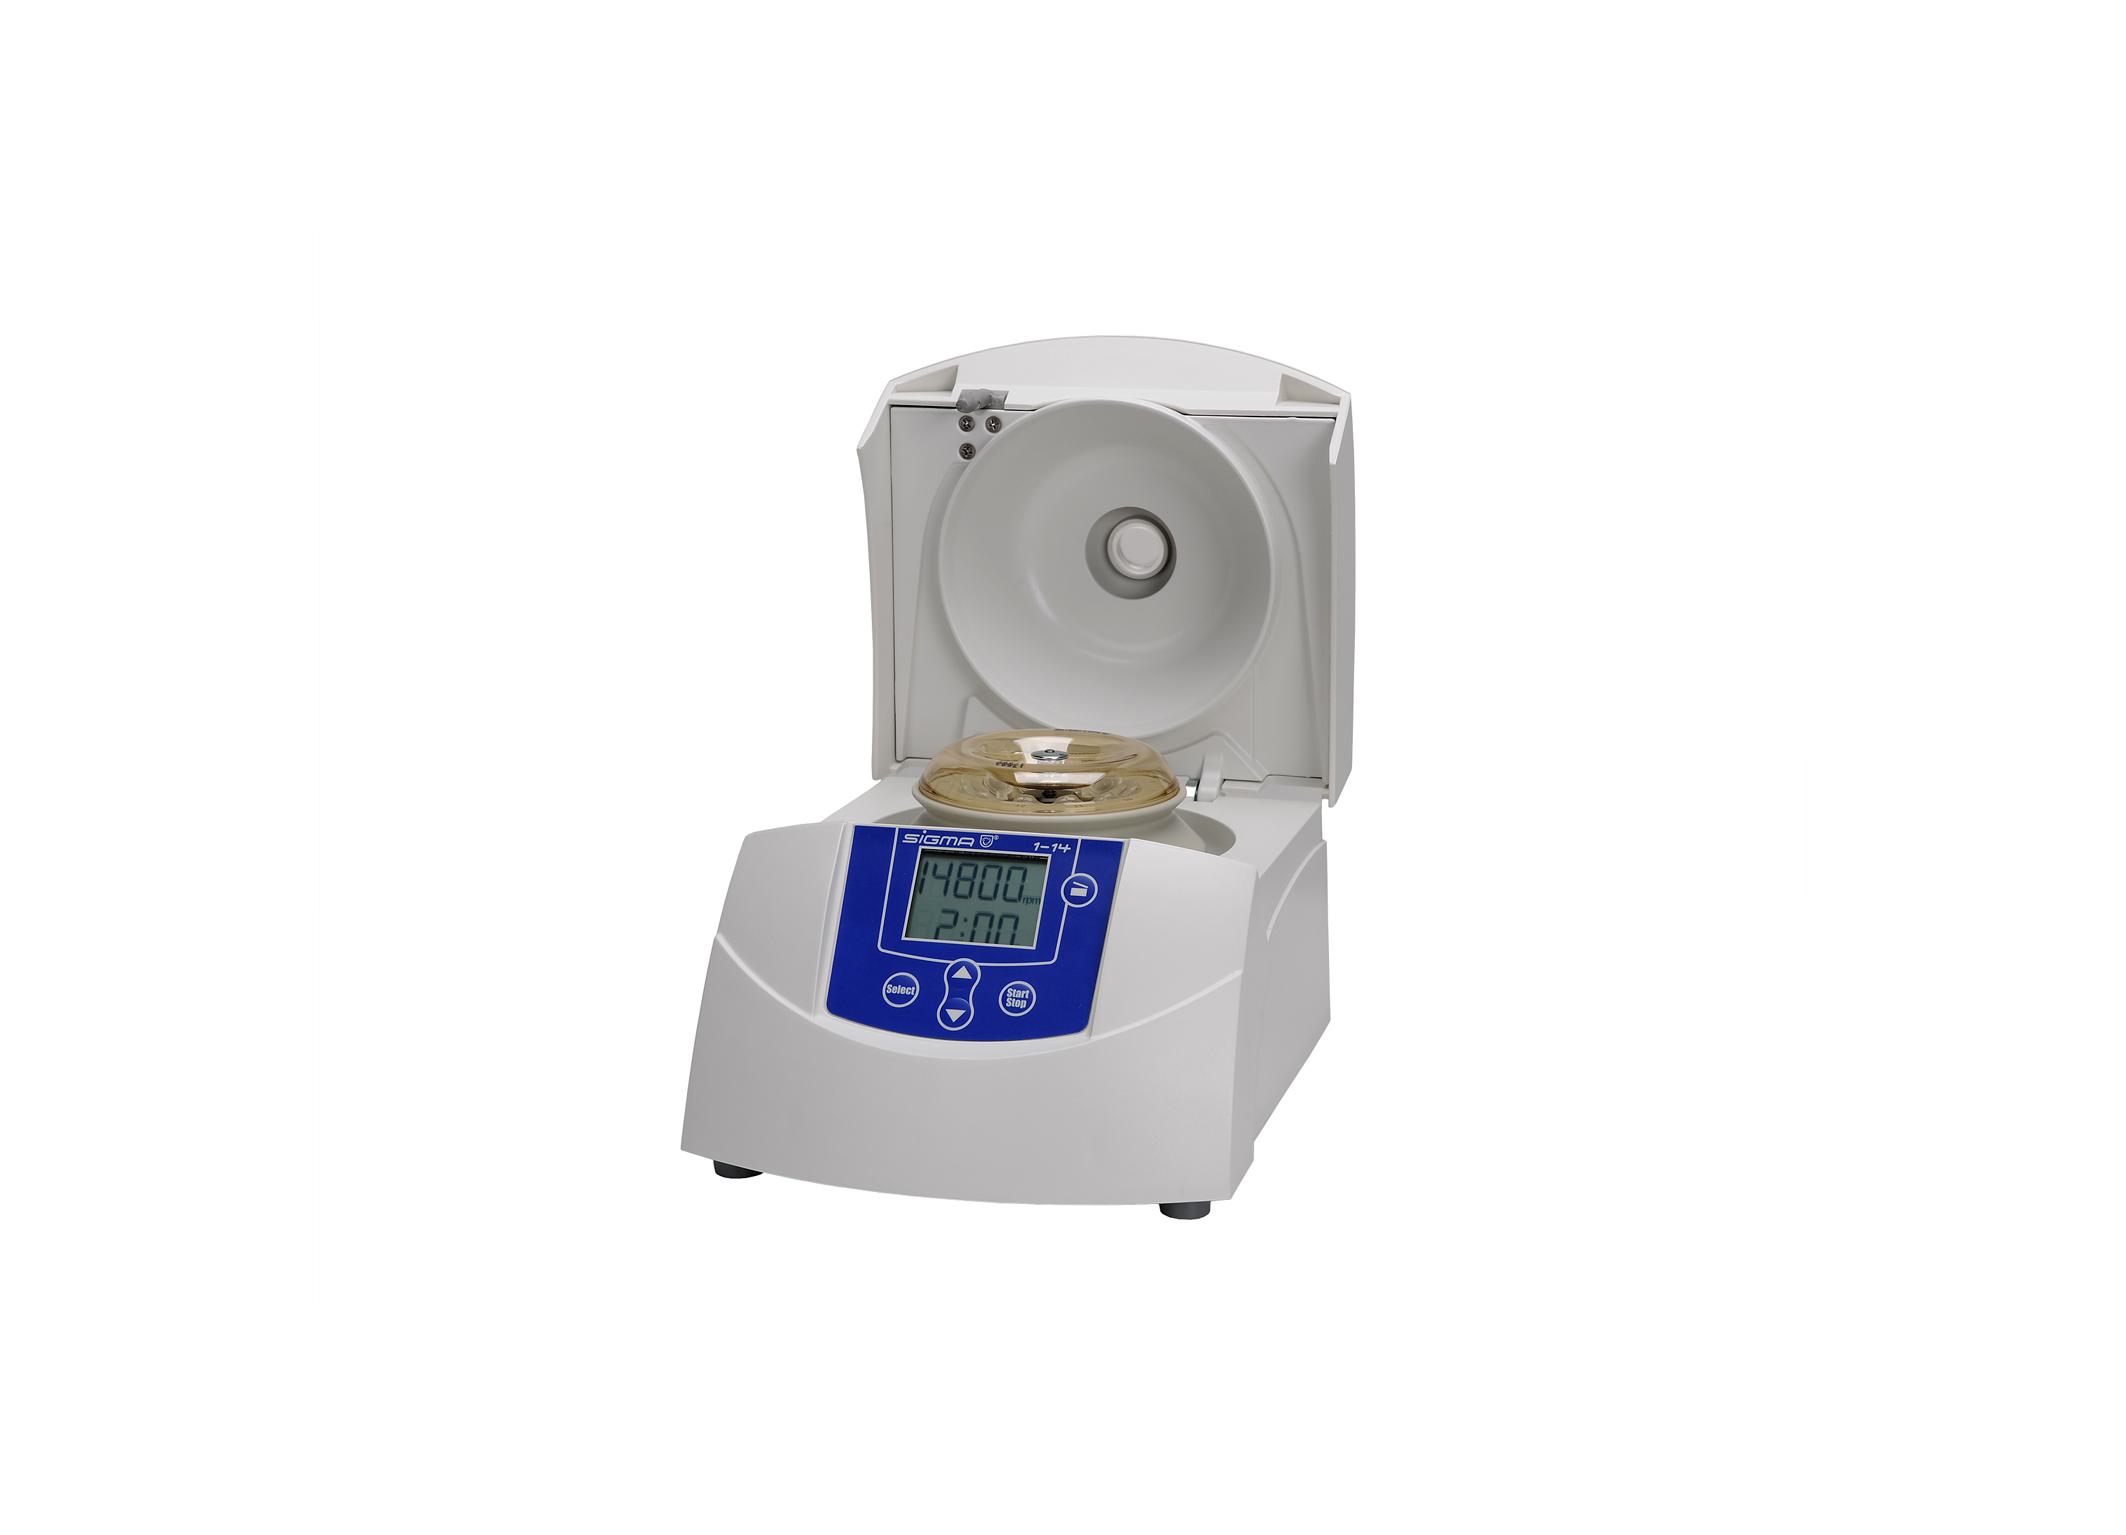 Sigma 1-14 centrifuge open lid